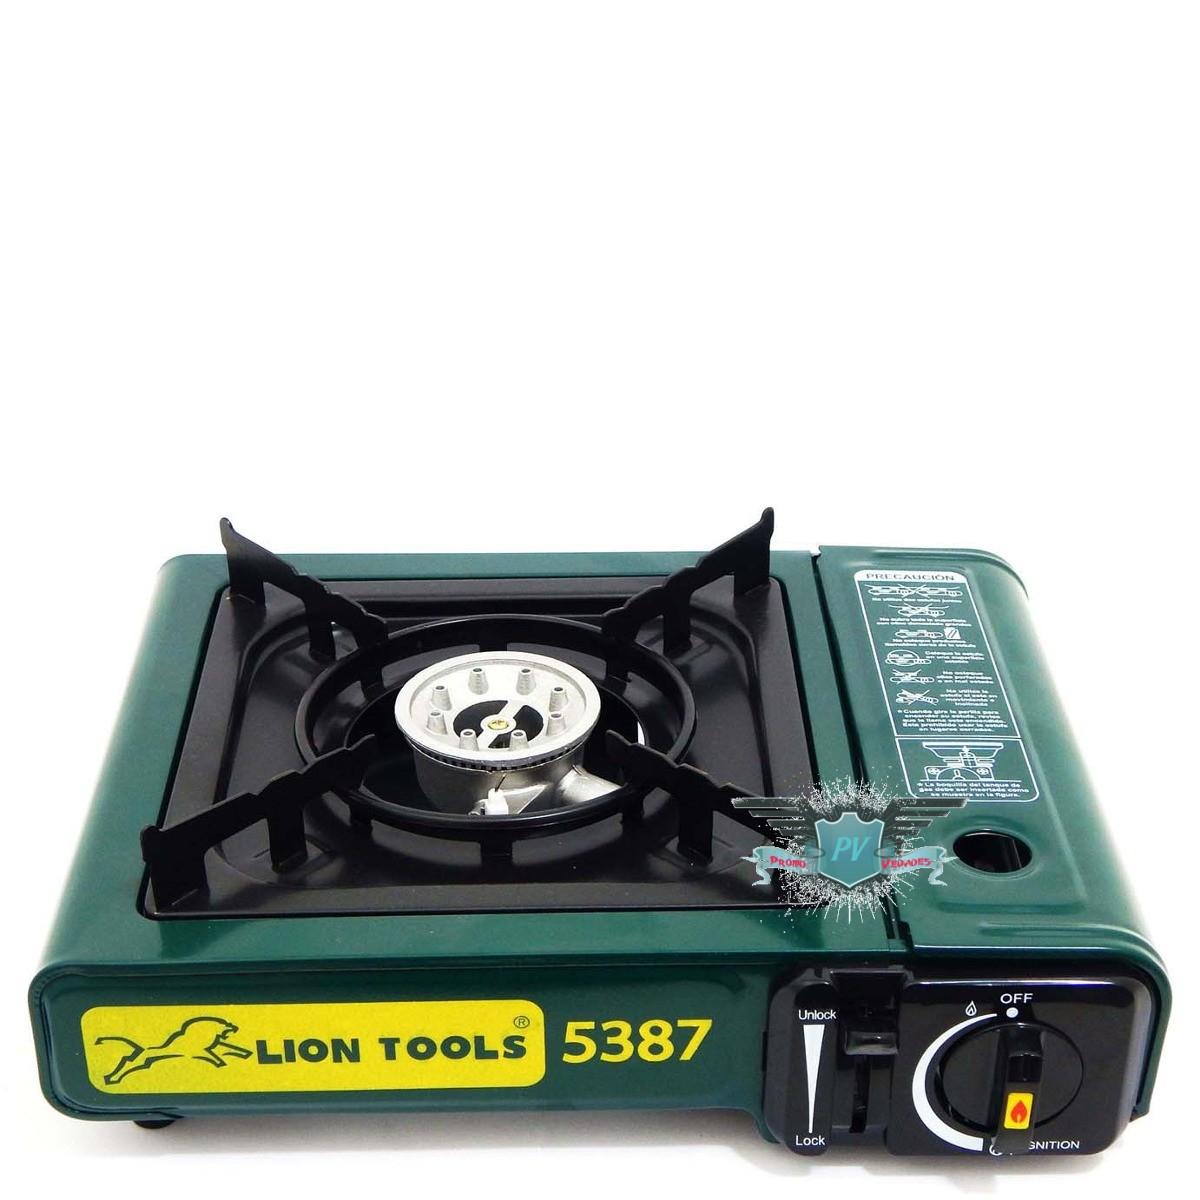 Promovedades estufa portatil de gas butano campismo - Estufas de gas para interior ...